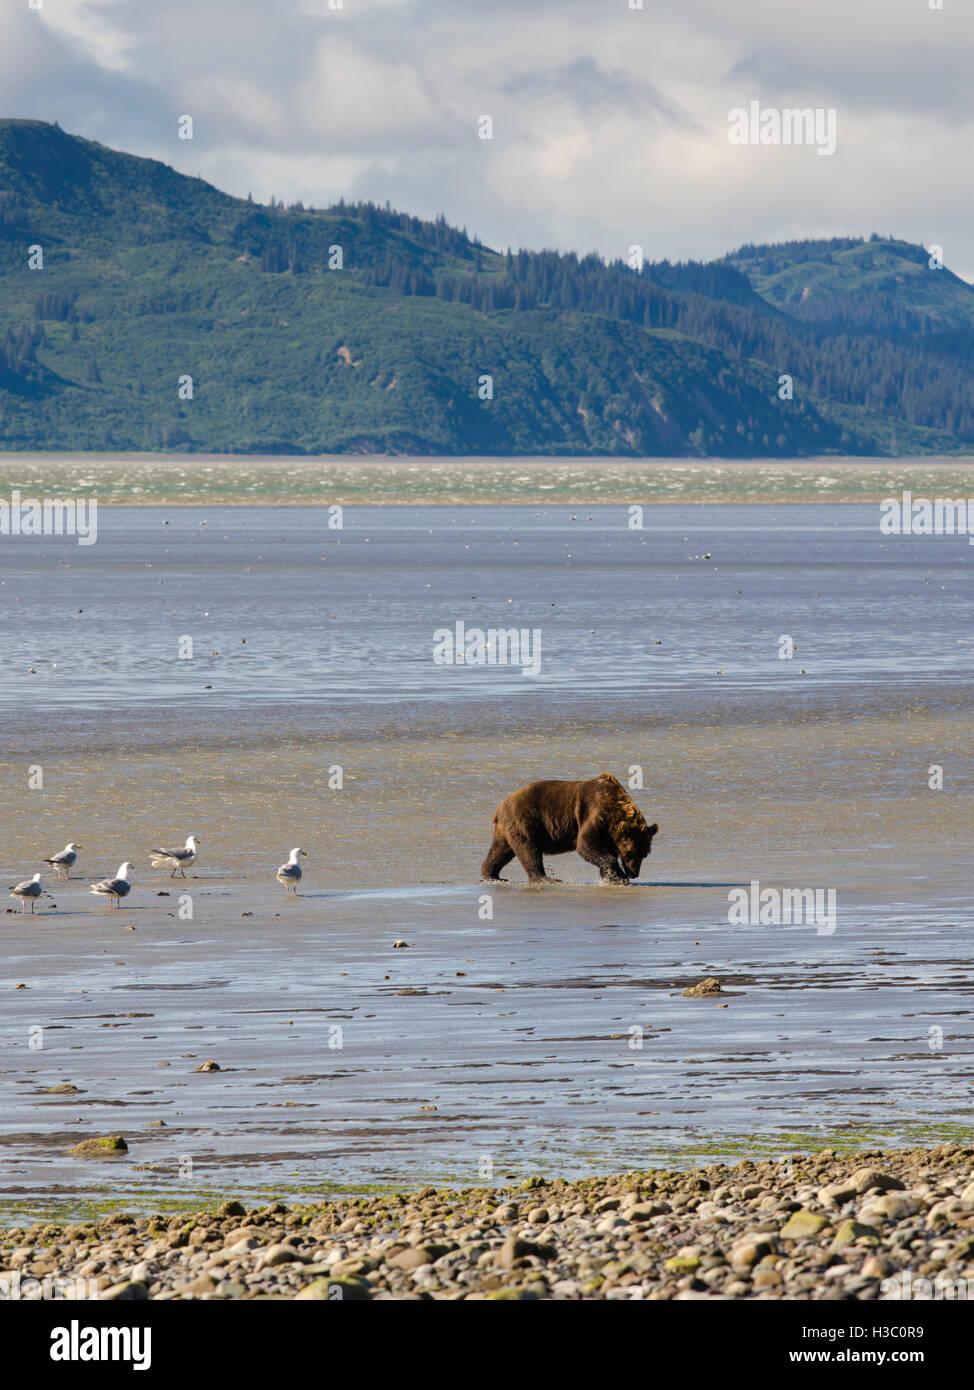 An Alaska coastal brown bear digs for clams in the tidal flat of Chinitna Bay, Lake Clark National Park, Alaska. - Stock Image